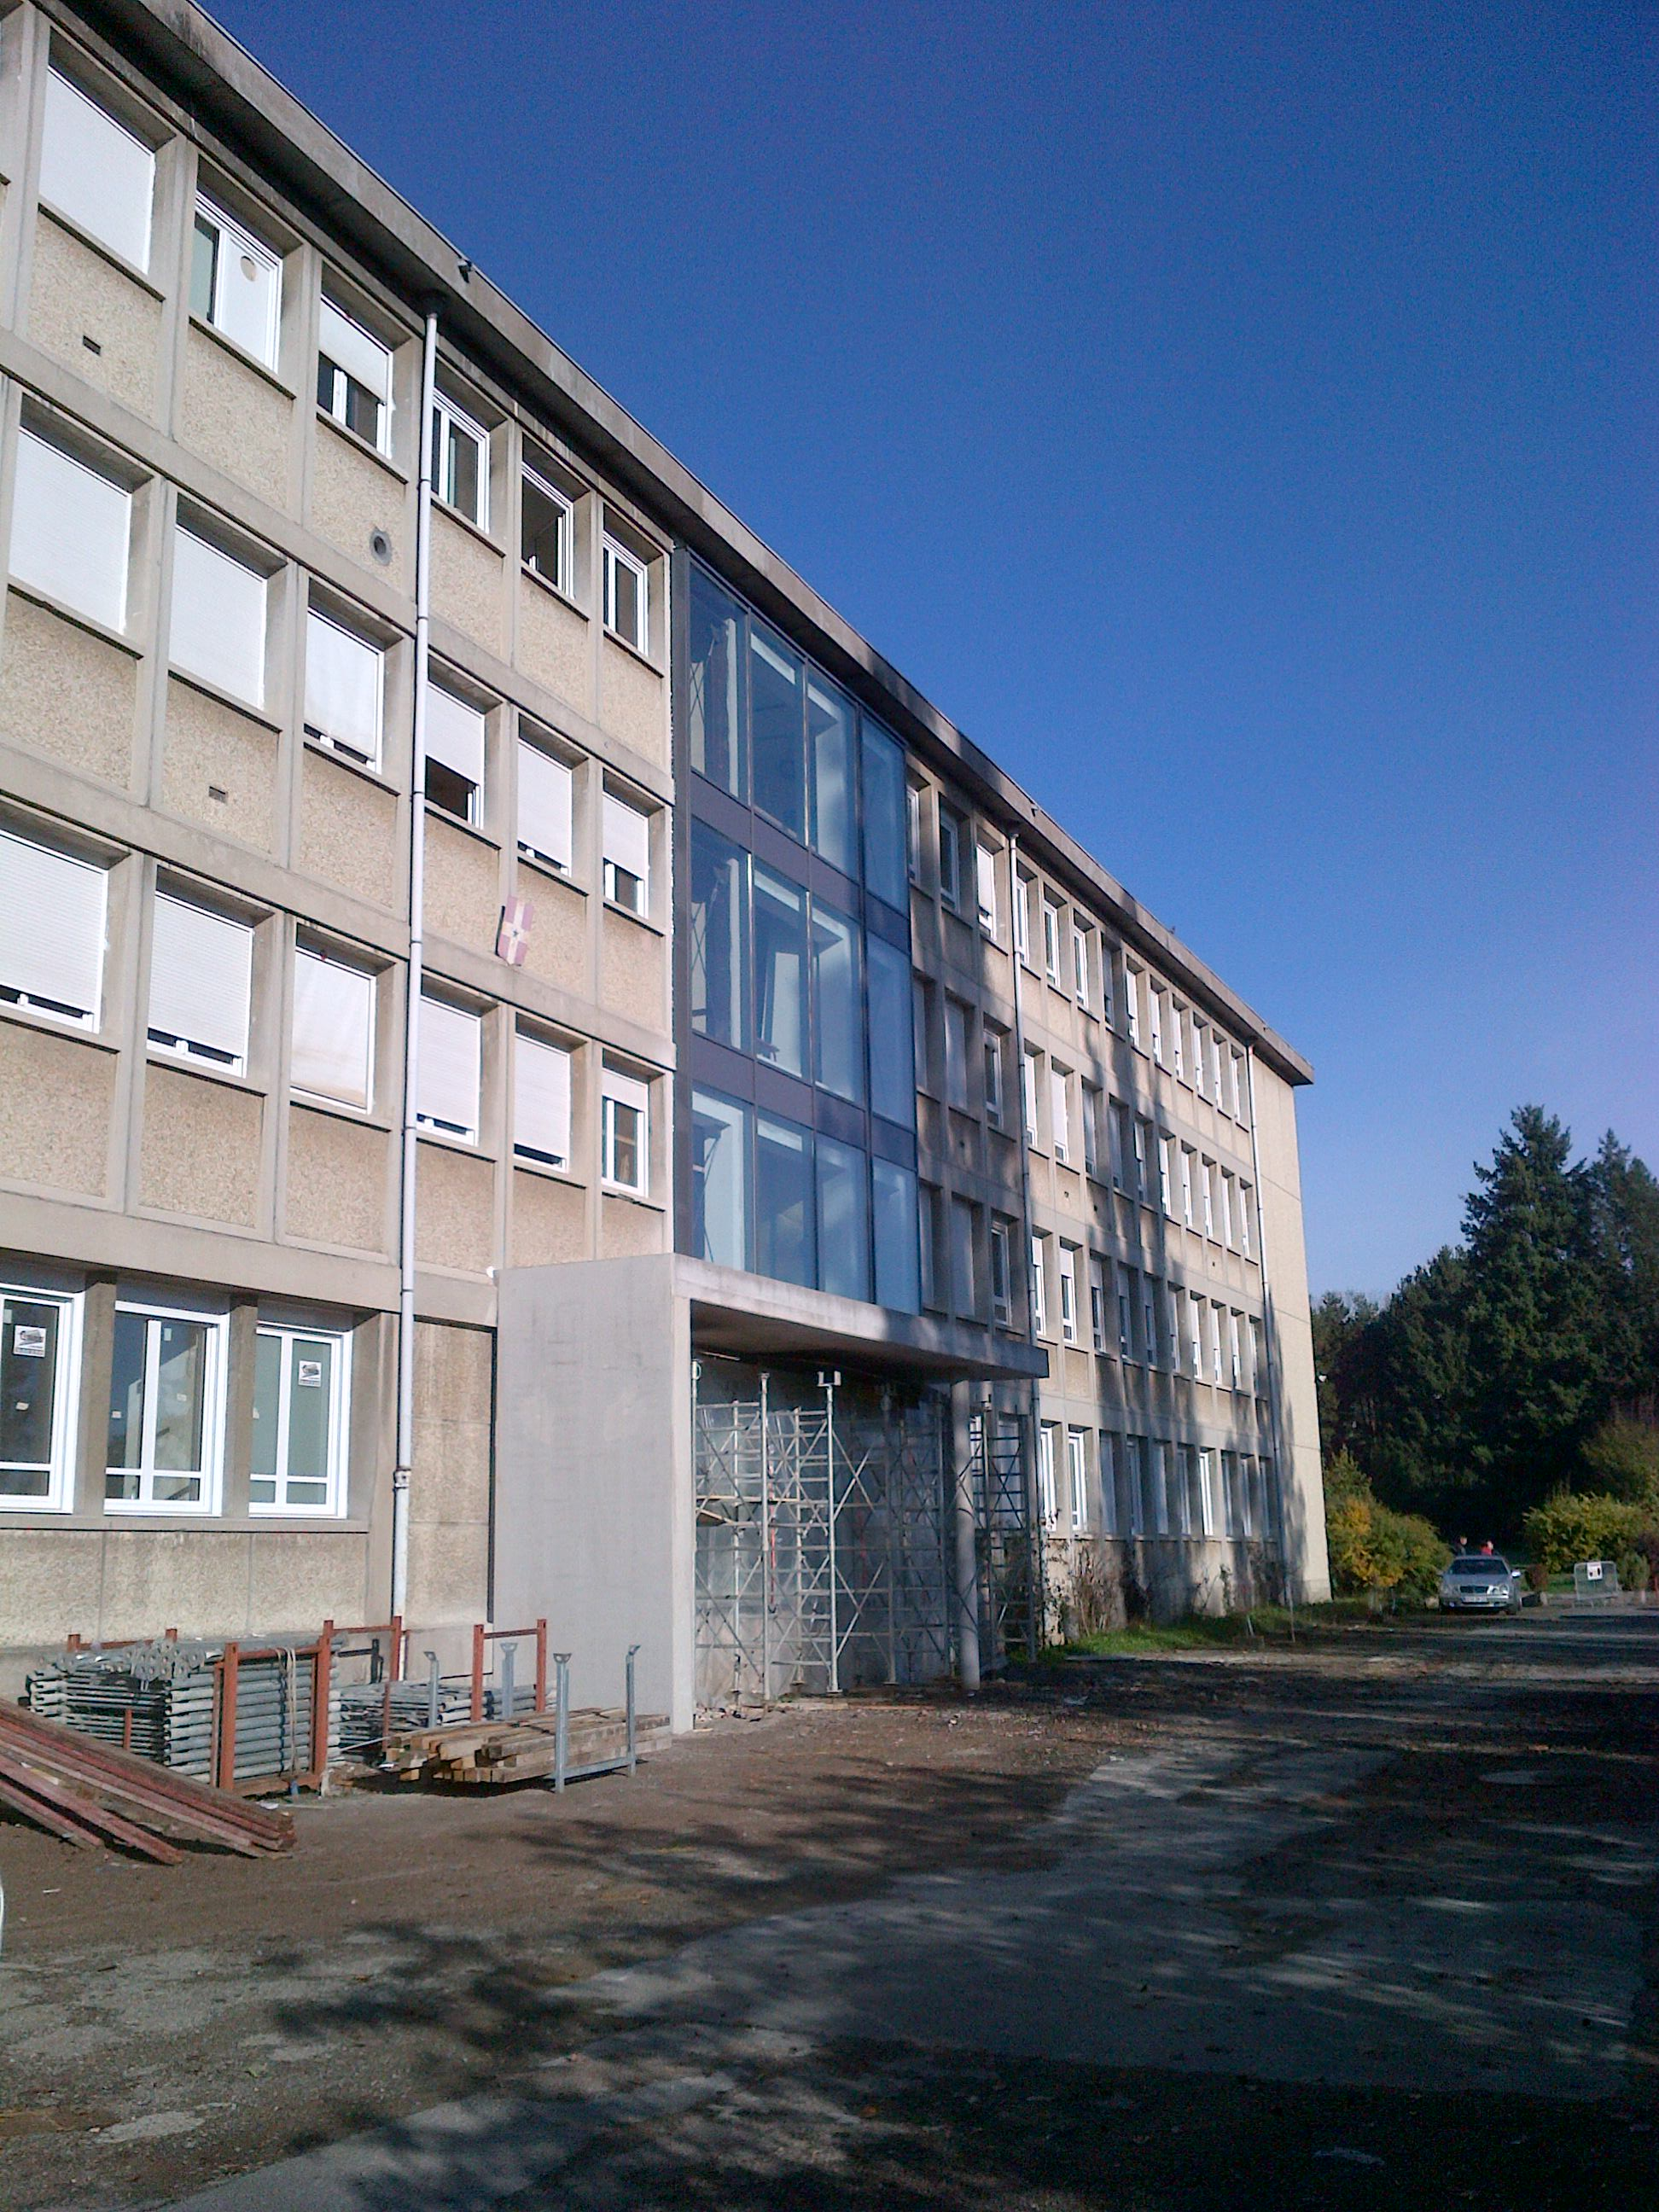 2013 - MONTBELIARD - Lycée Cuvier externat1.jpg